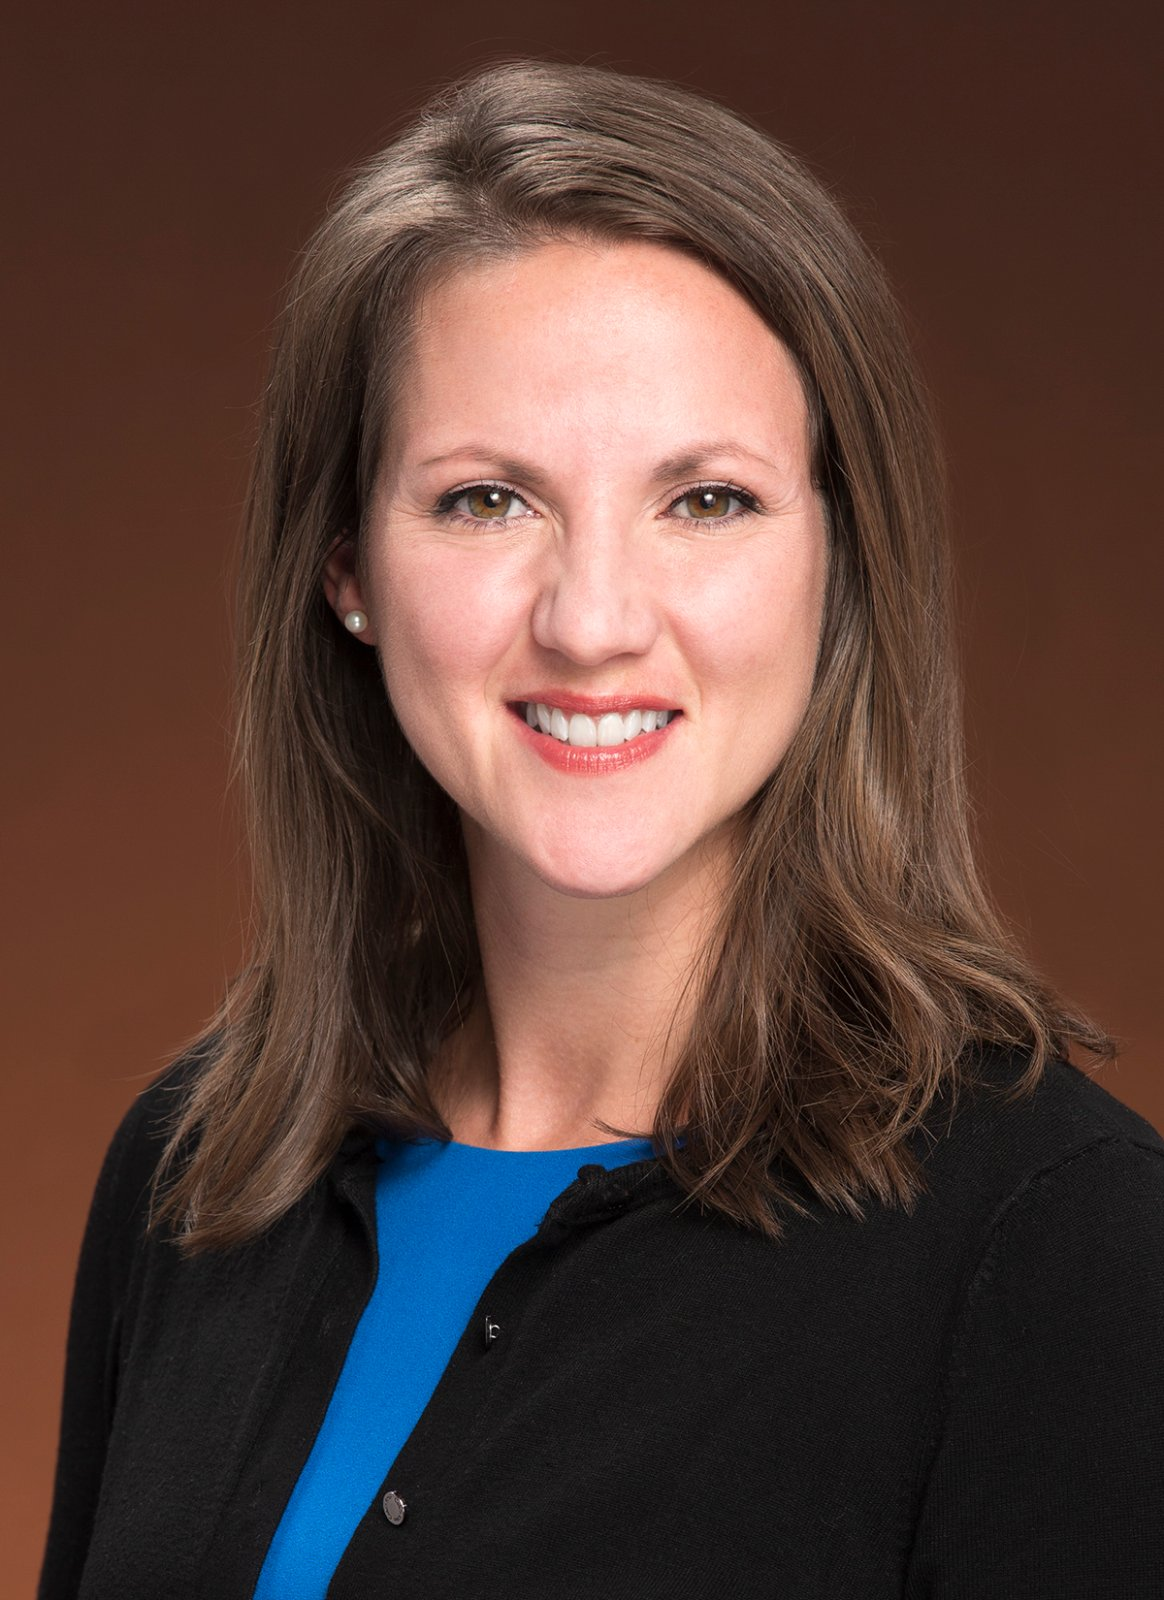 Christie Dompierre, Marketing Director